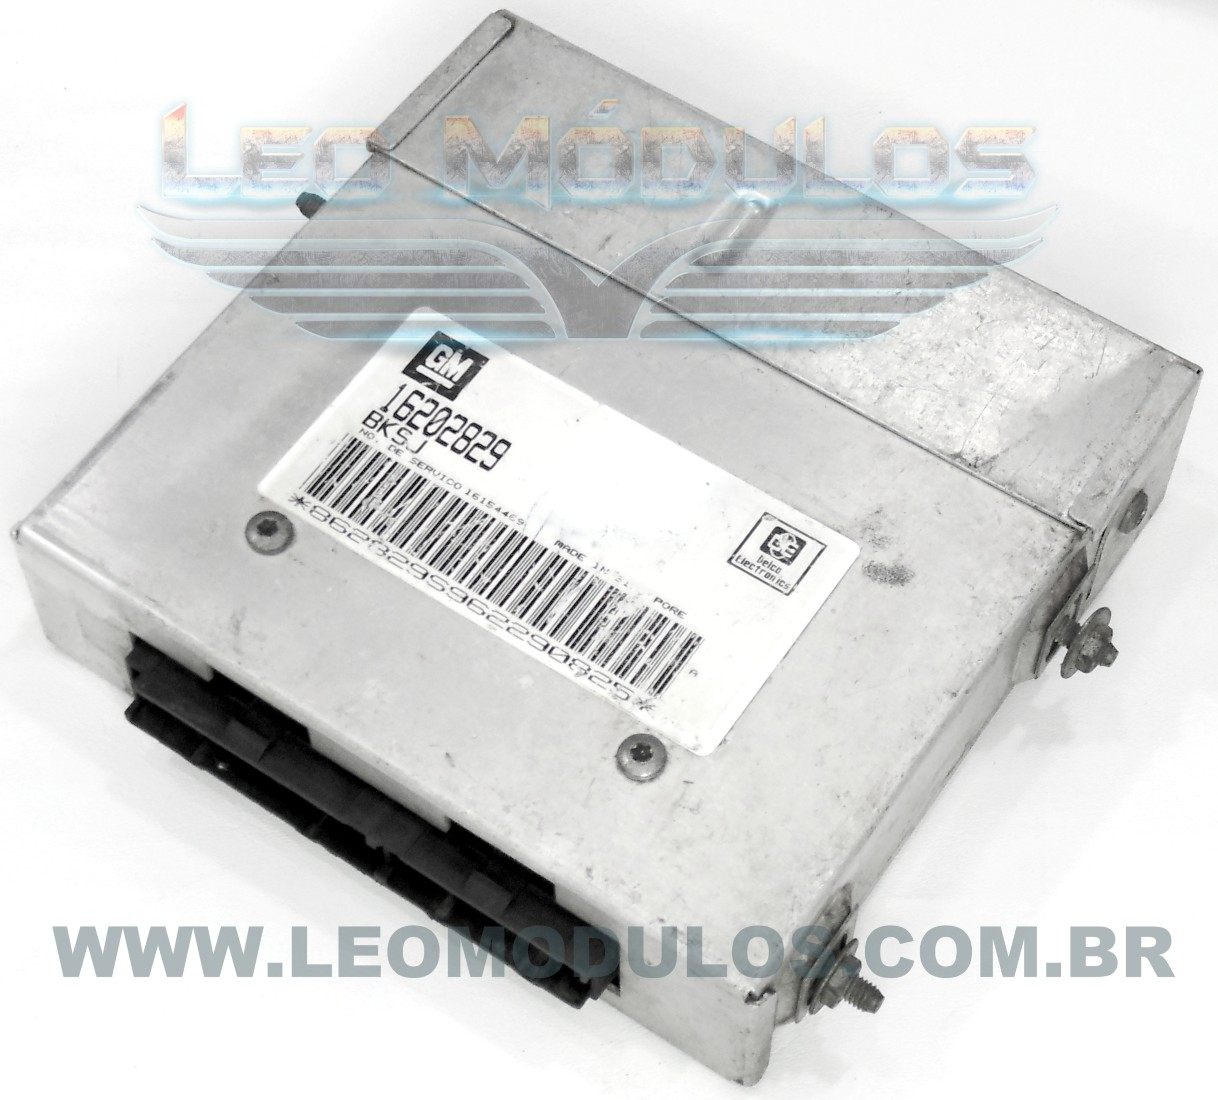 Módulo de injeção multec 700 - BKSJ 16202829 16202829 - Chevrolet Kadett Monza 2.0 8V - BKSJ - Leo Módulos